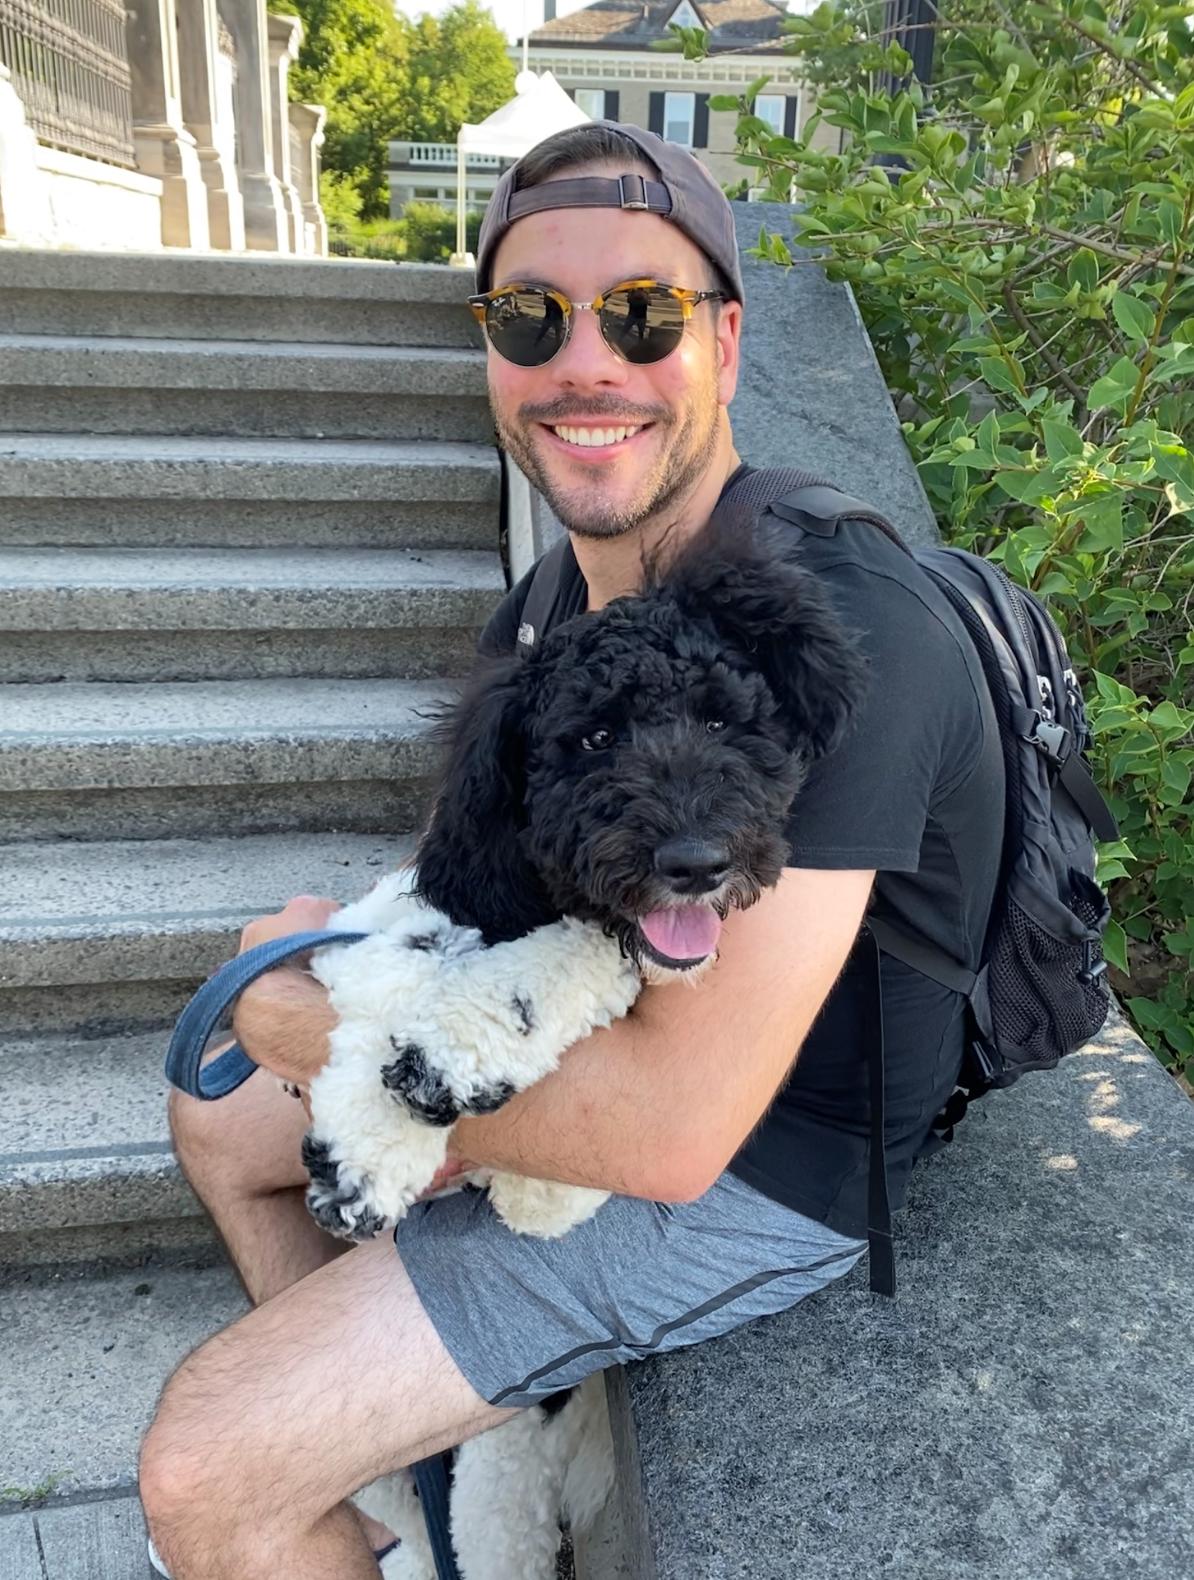 Matthew Volpini with his dog